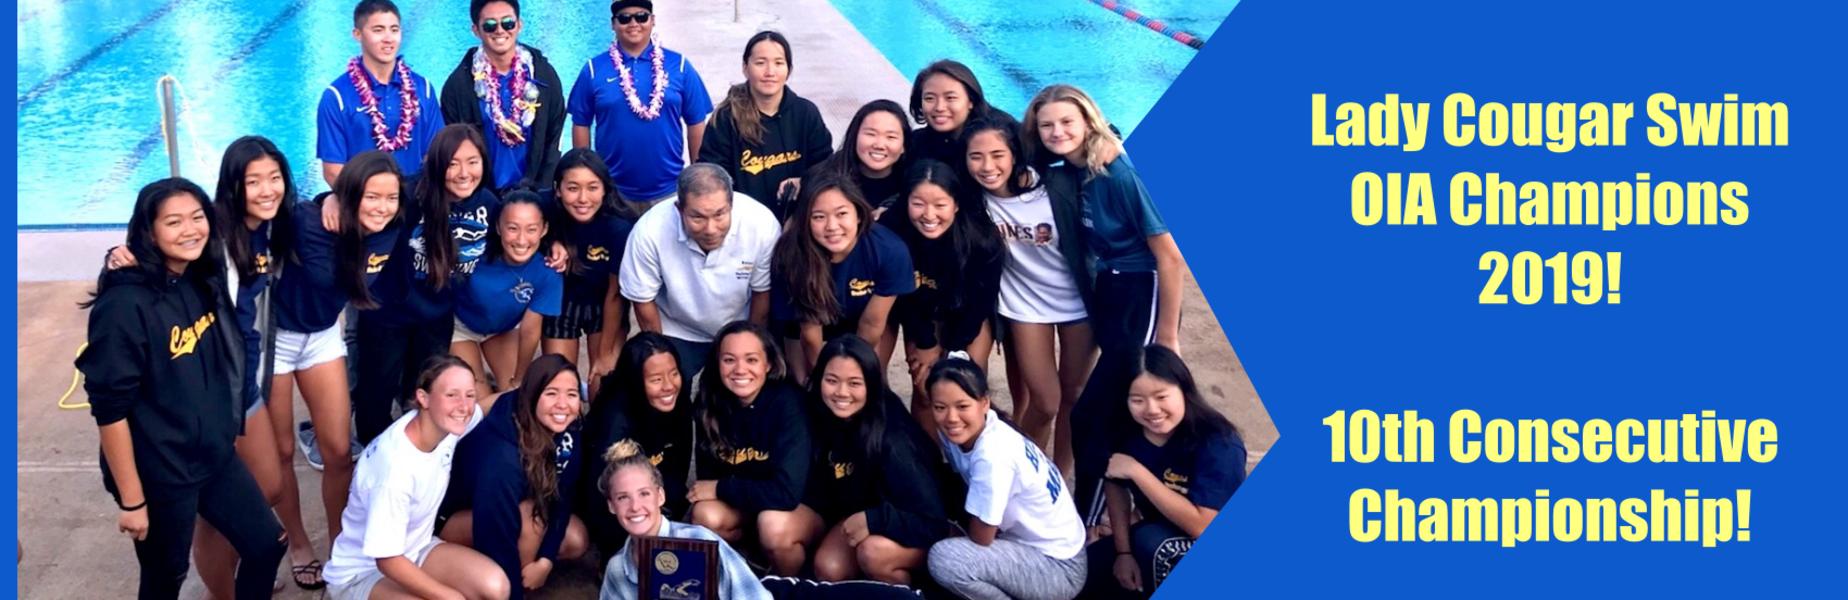 Lady Cougar swim champions 2019